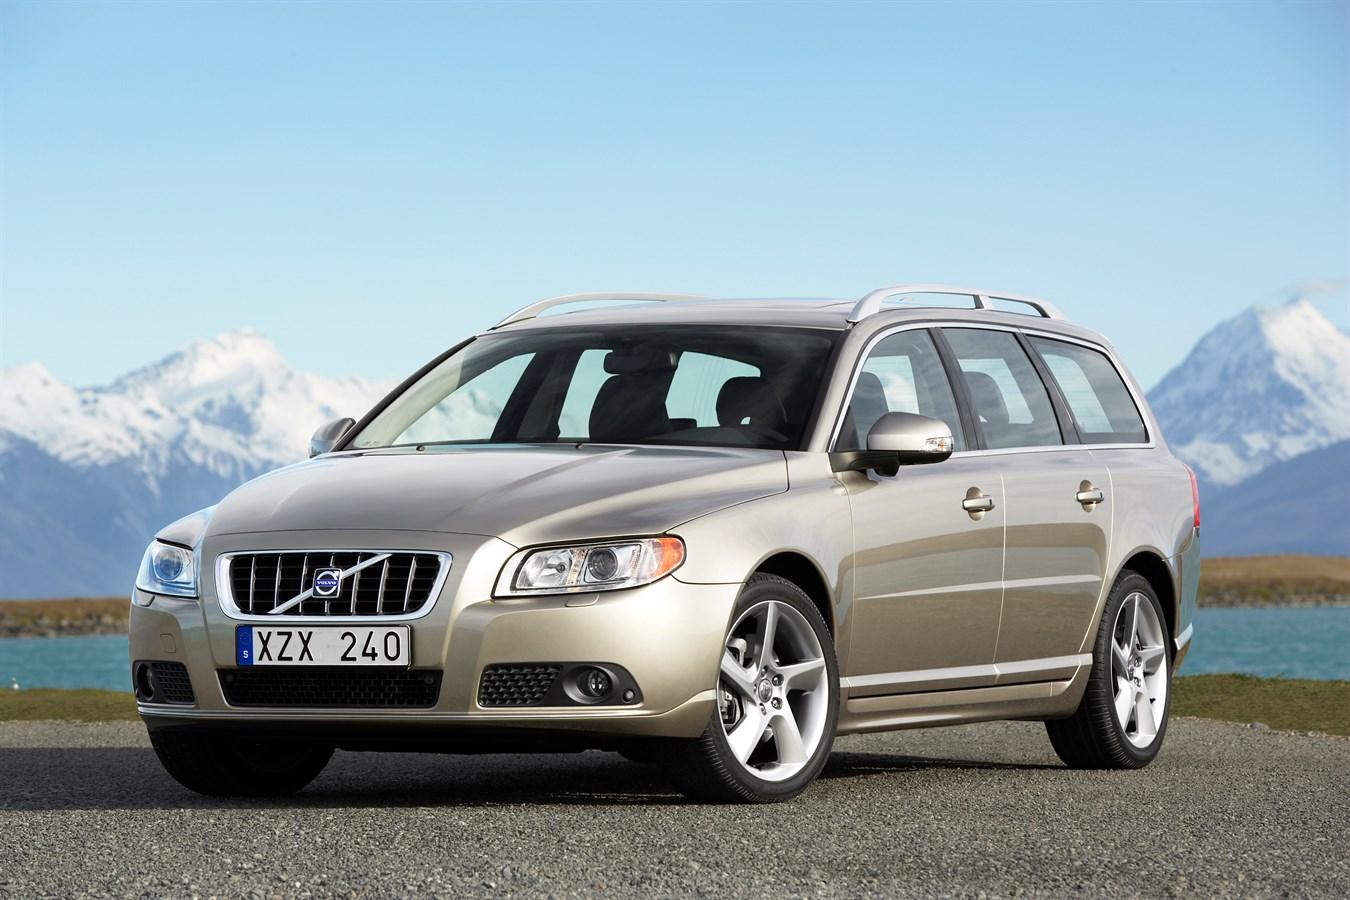 All new volvo v70 model year 2008 volvo car group global media newsroom